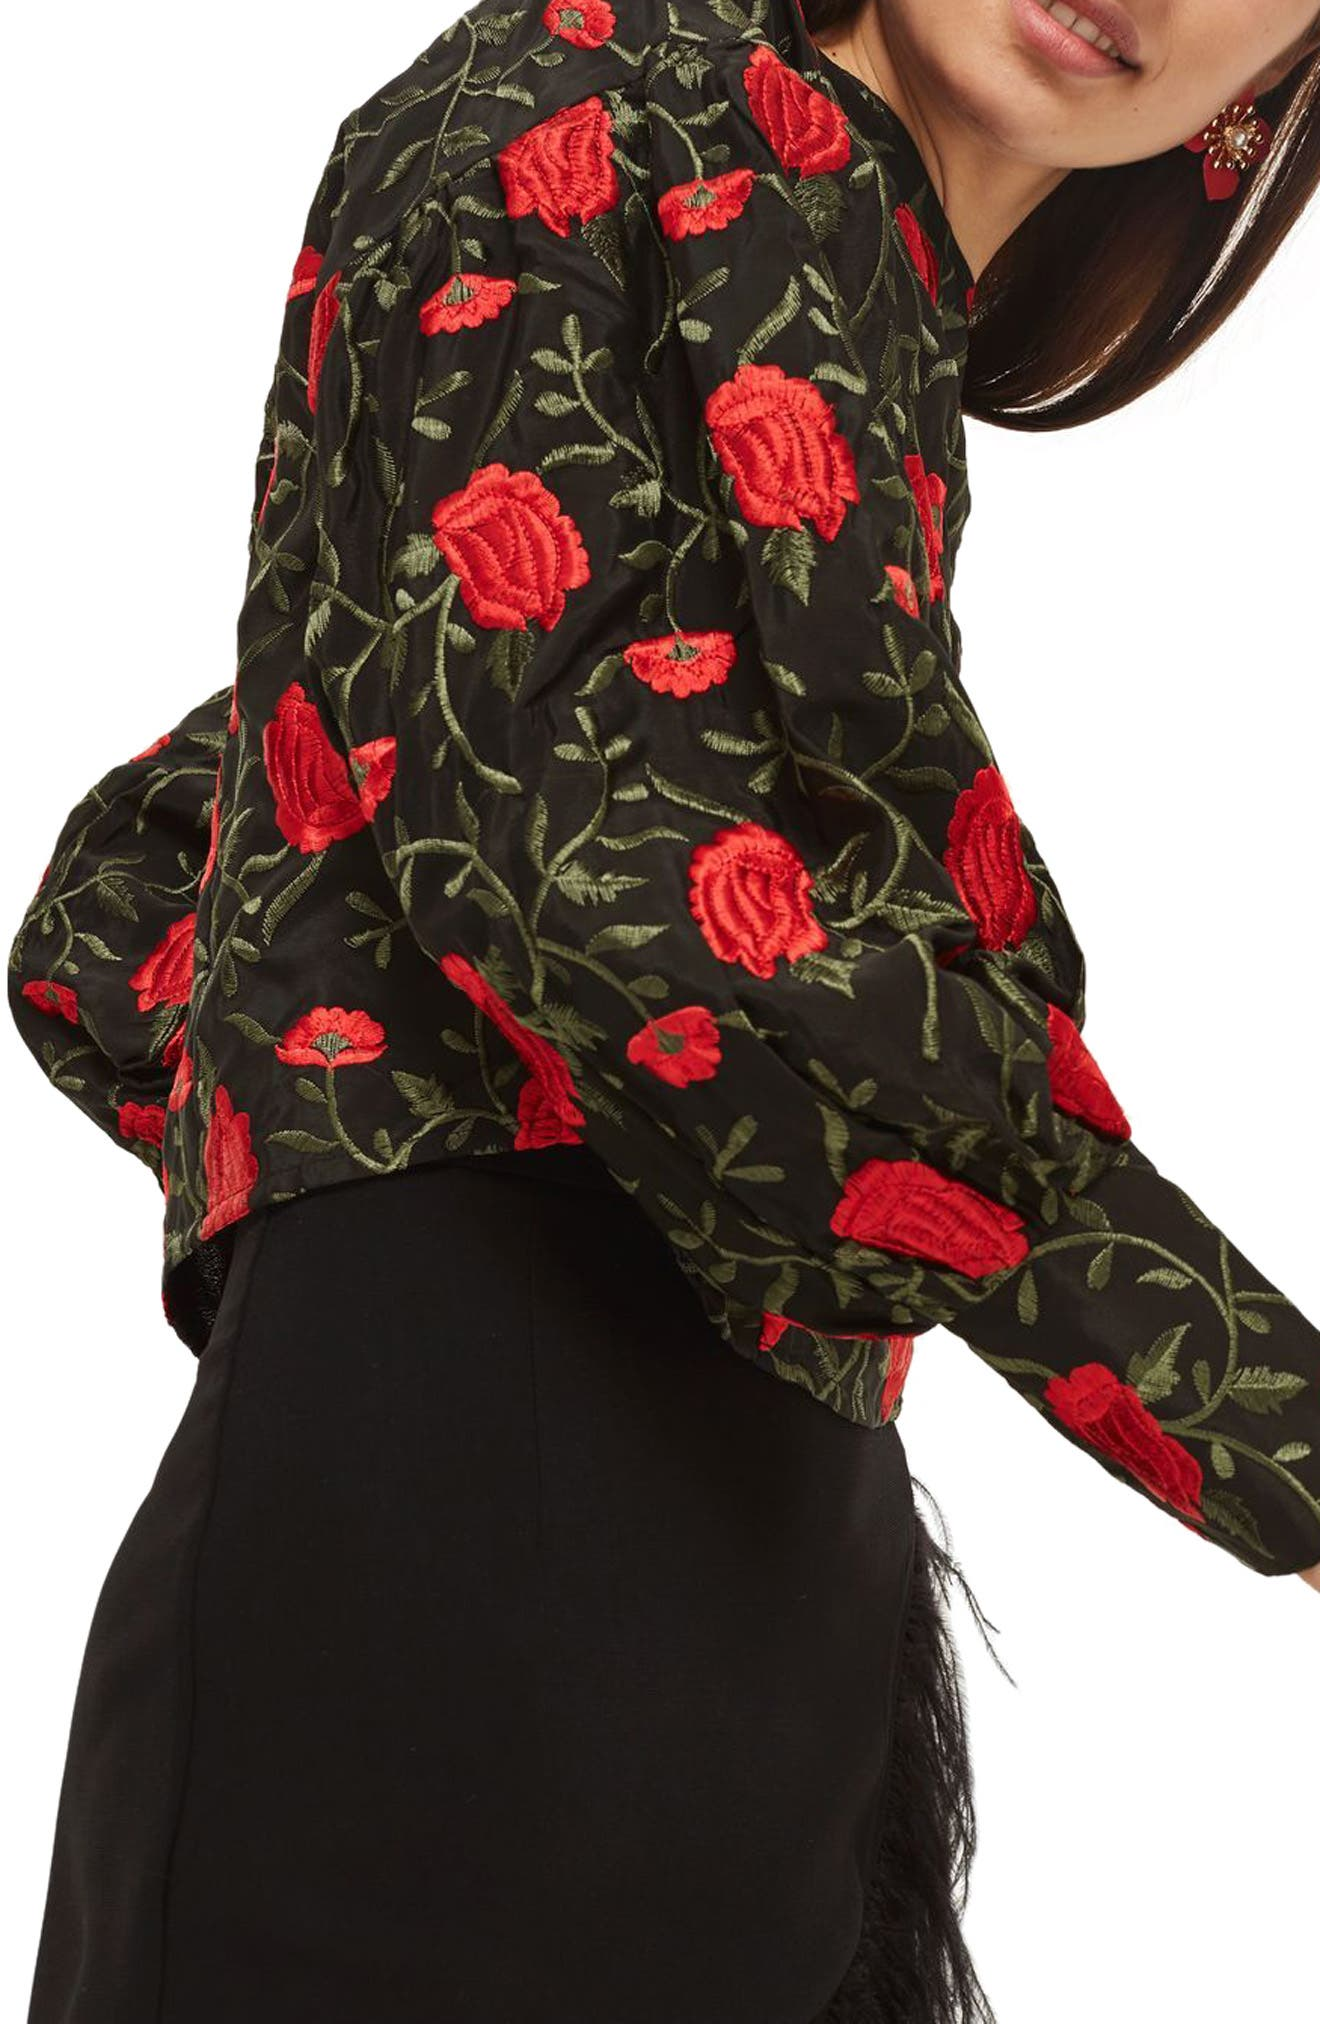 Rose Embroidered Balloon Sleeve Blouse,                             Alternate thumbnail 3, color,                             Black Multi